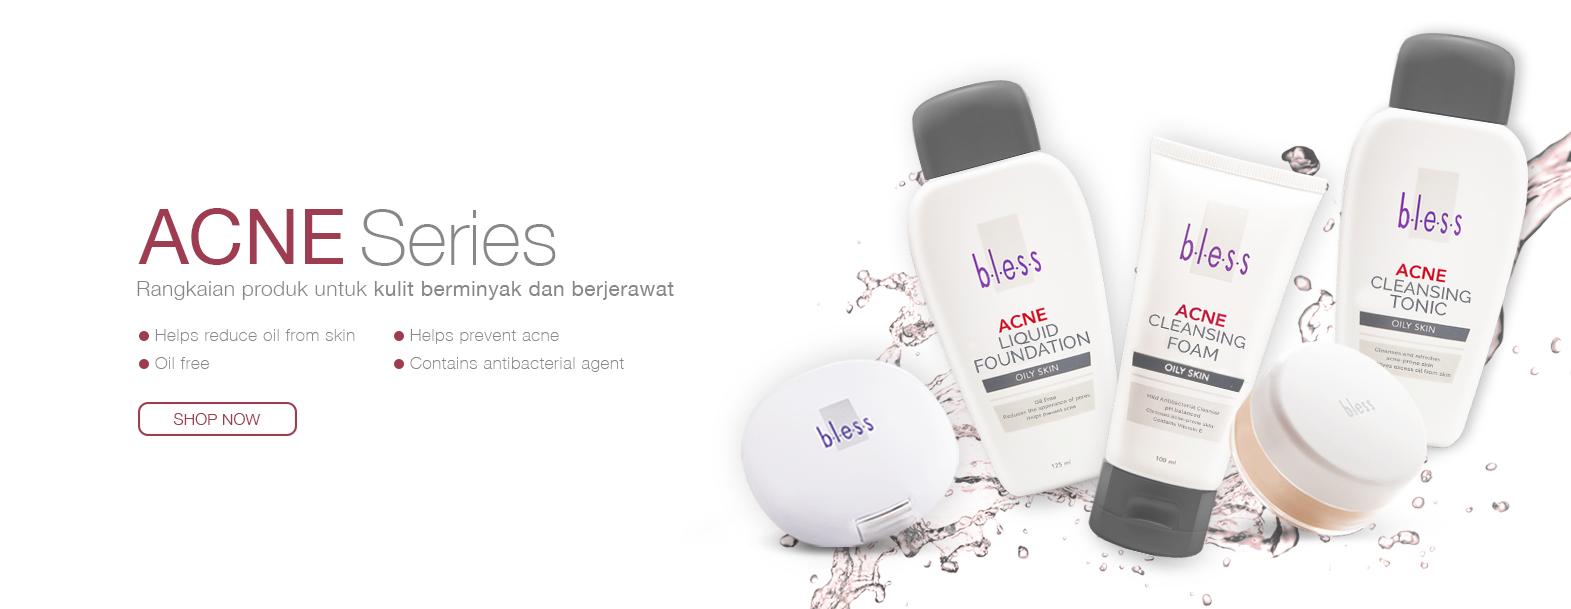 01-slide-acne-series